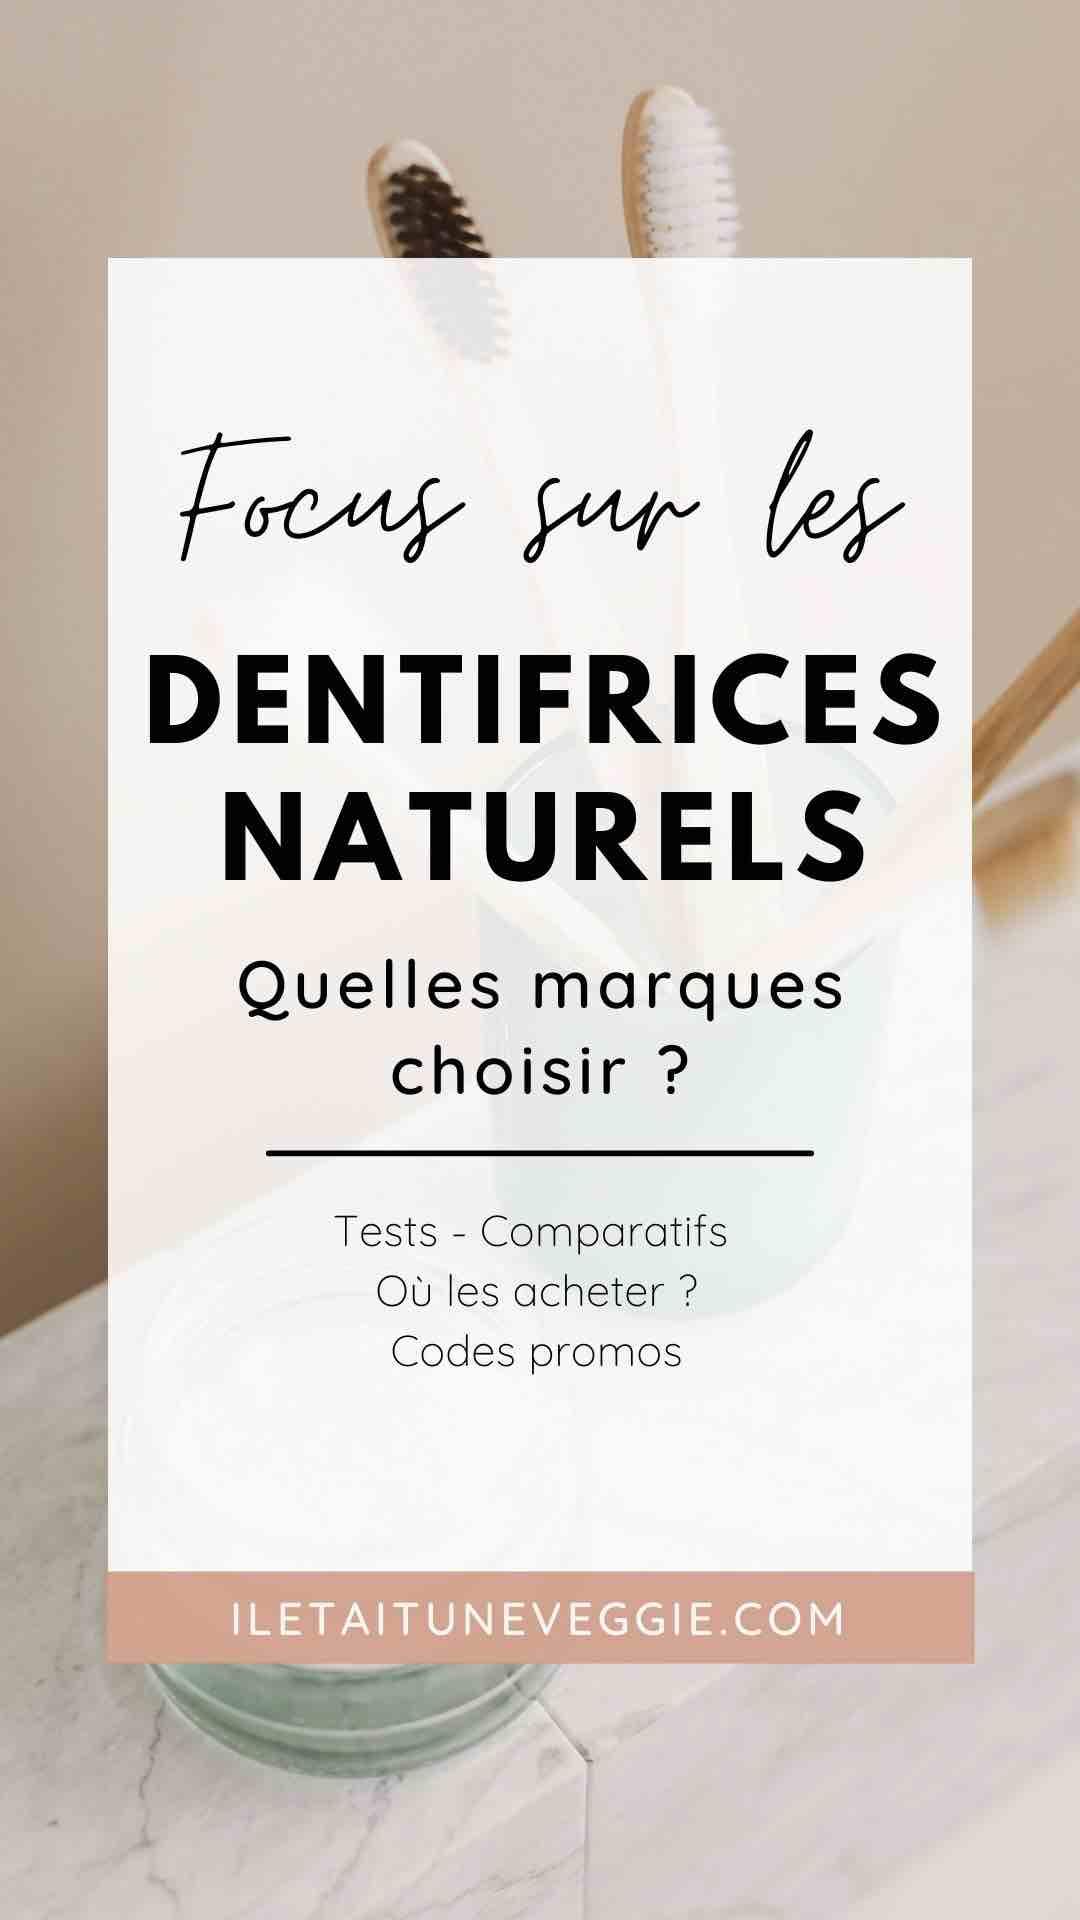 Dentifrices cruelty free et naturels comparatif marques